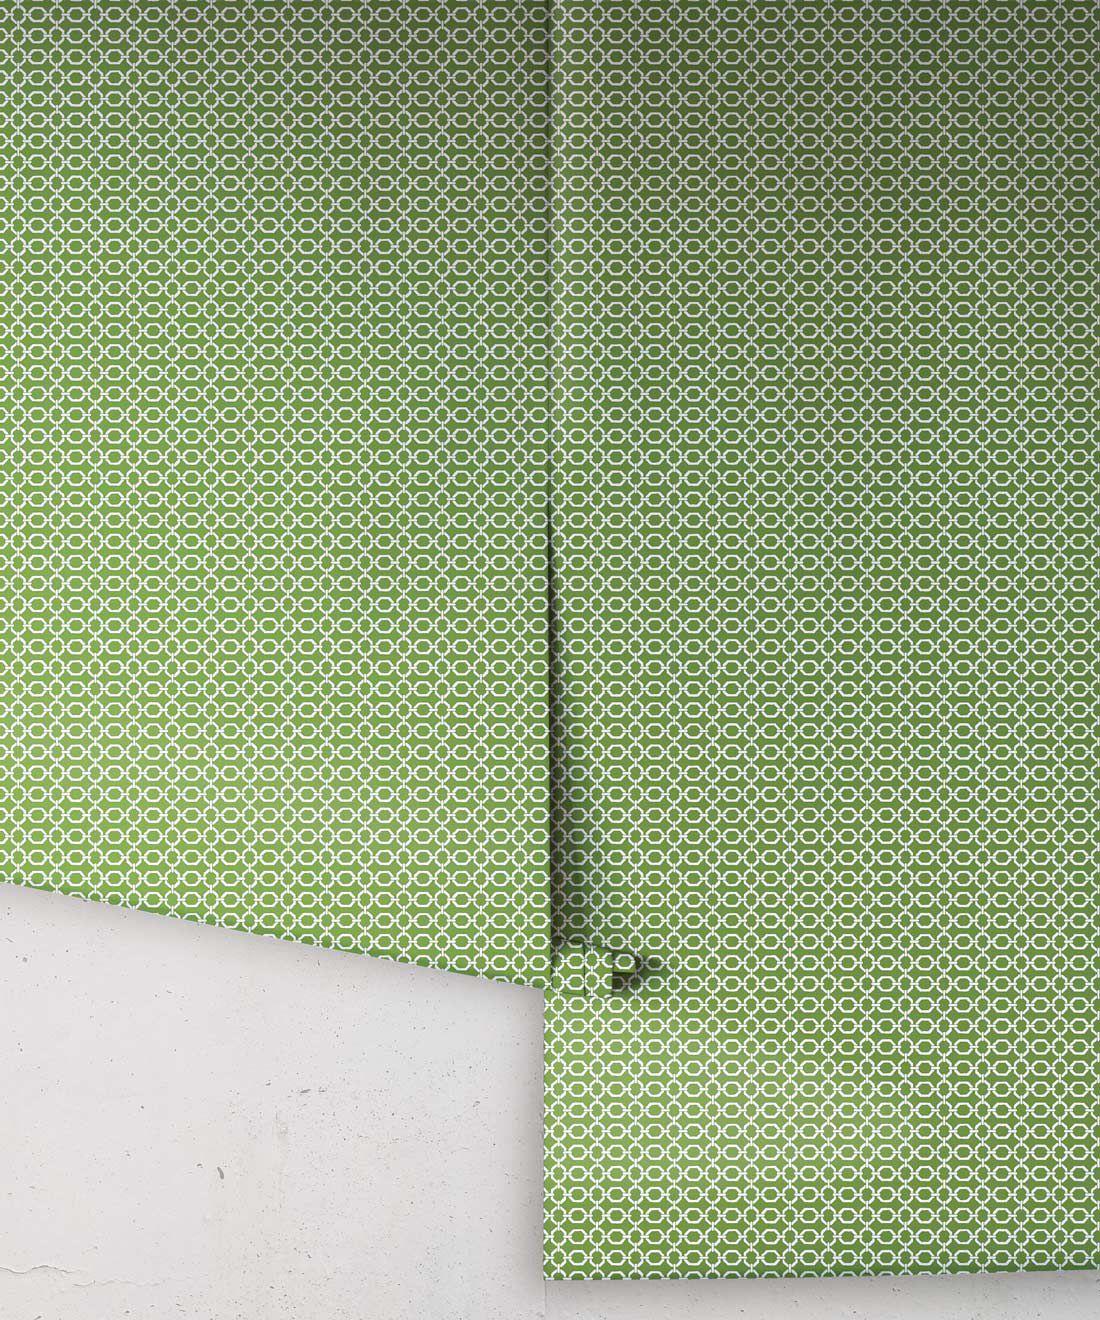 Ravello Wallpaper • Dianne Bergeron • Parsley •Rolls